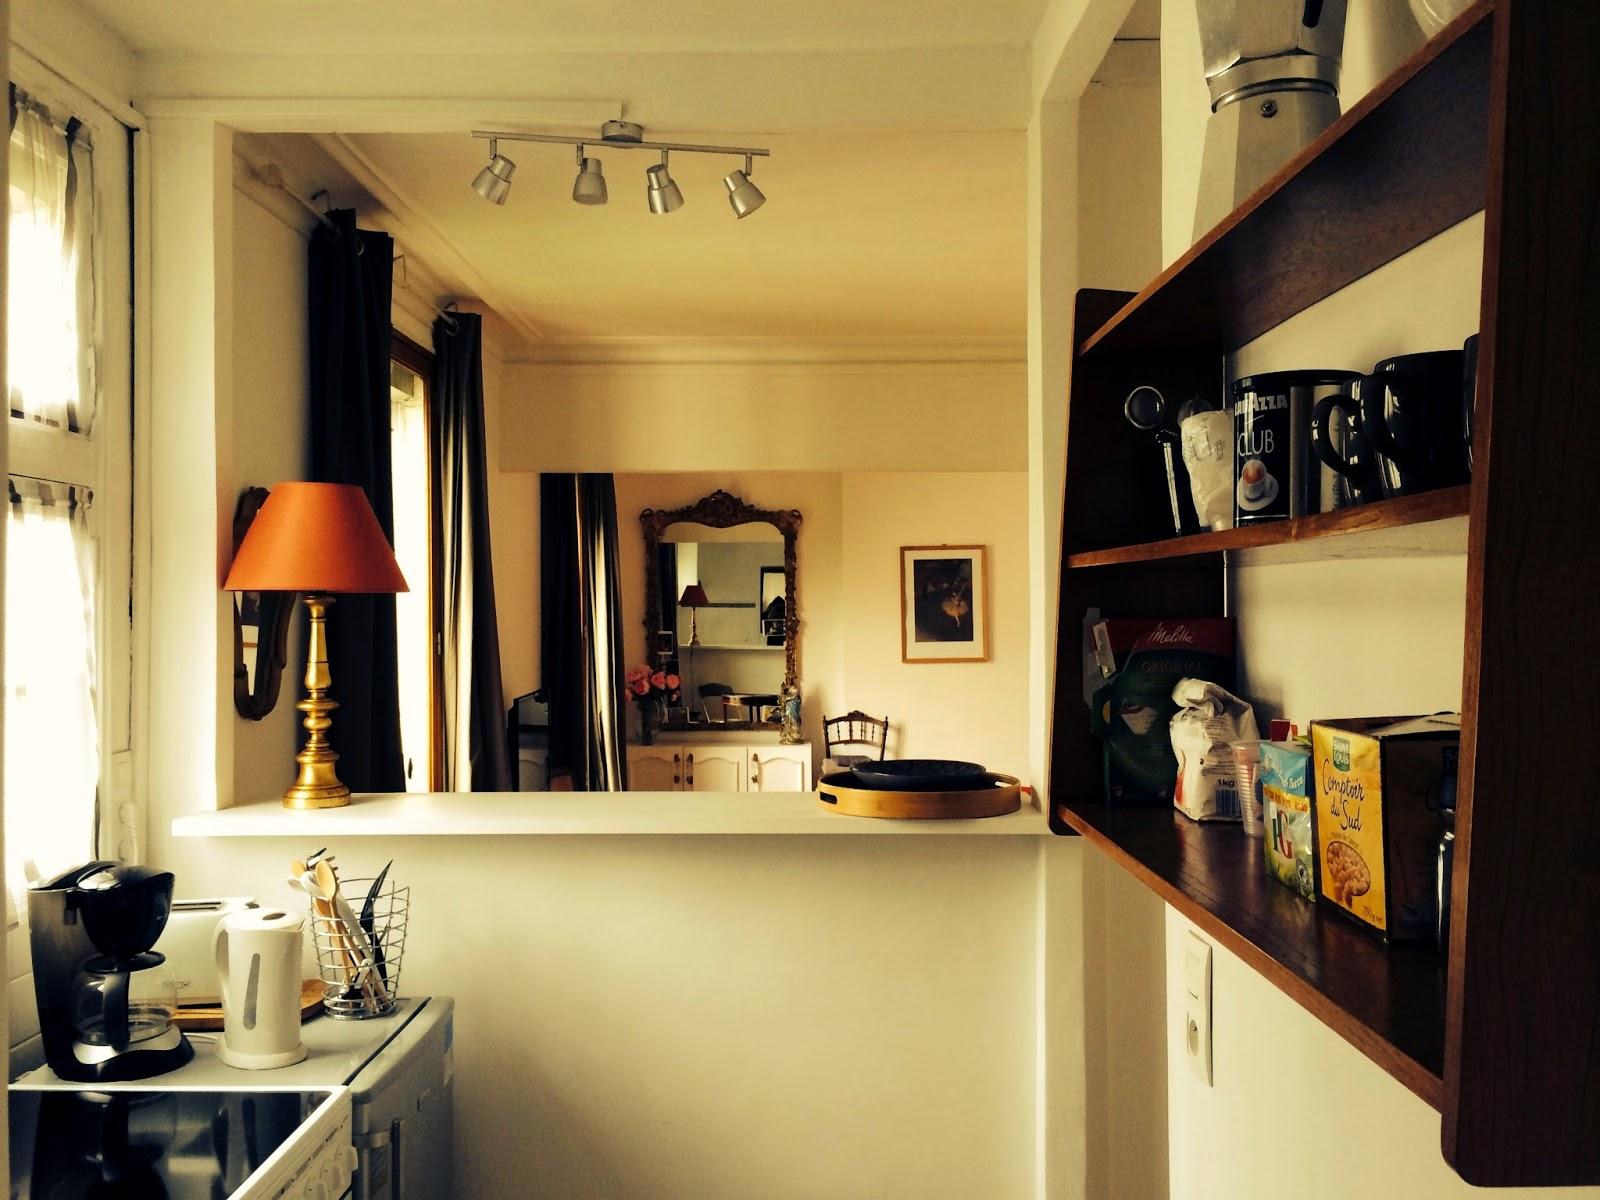 Affitto appartamento a parigi casa vacanza centrale bella economica - Casa vacanza a parigi ...